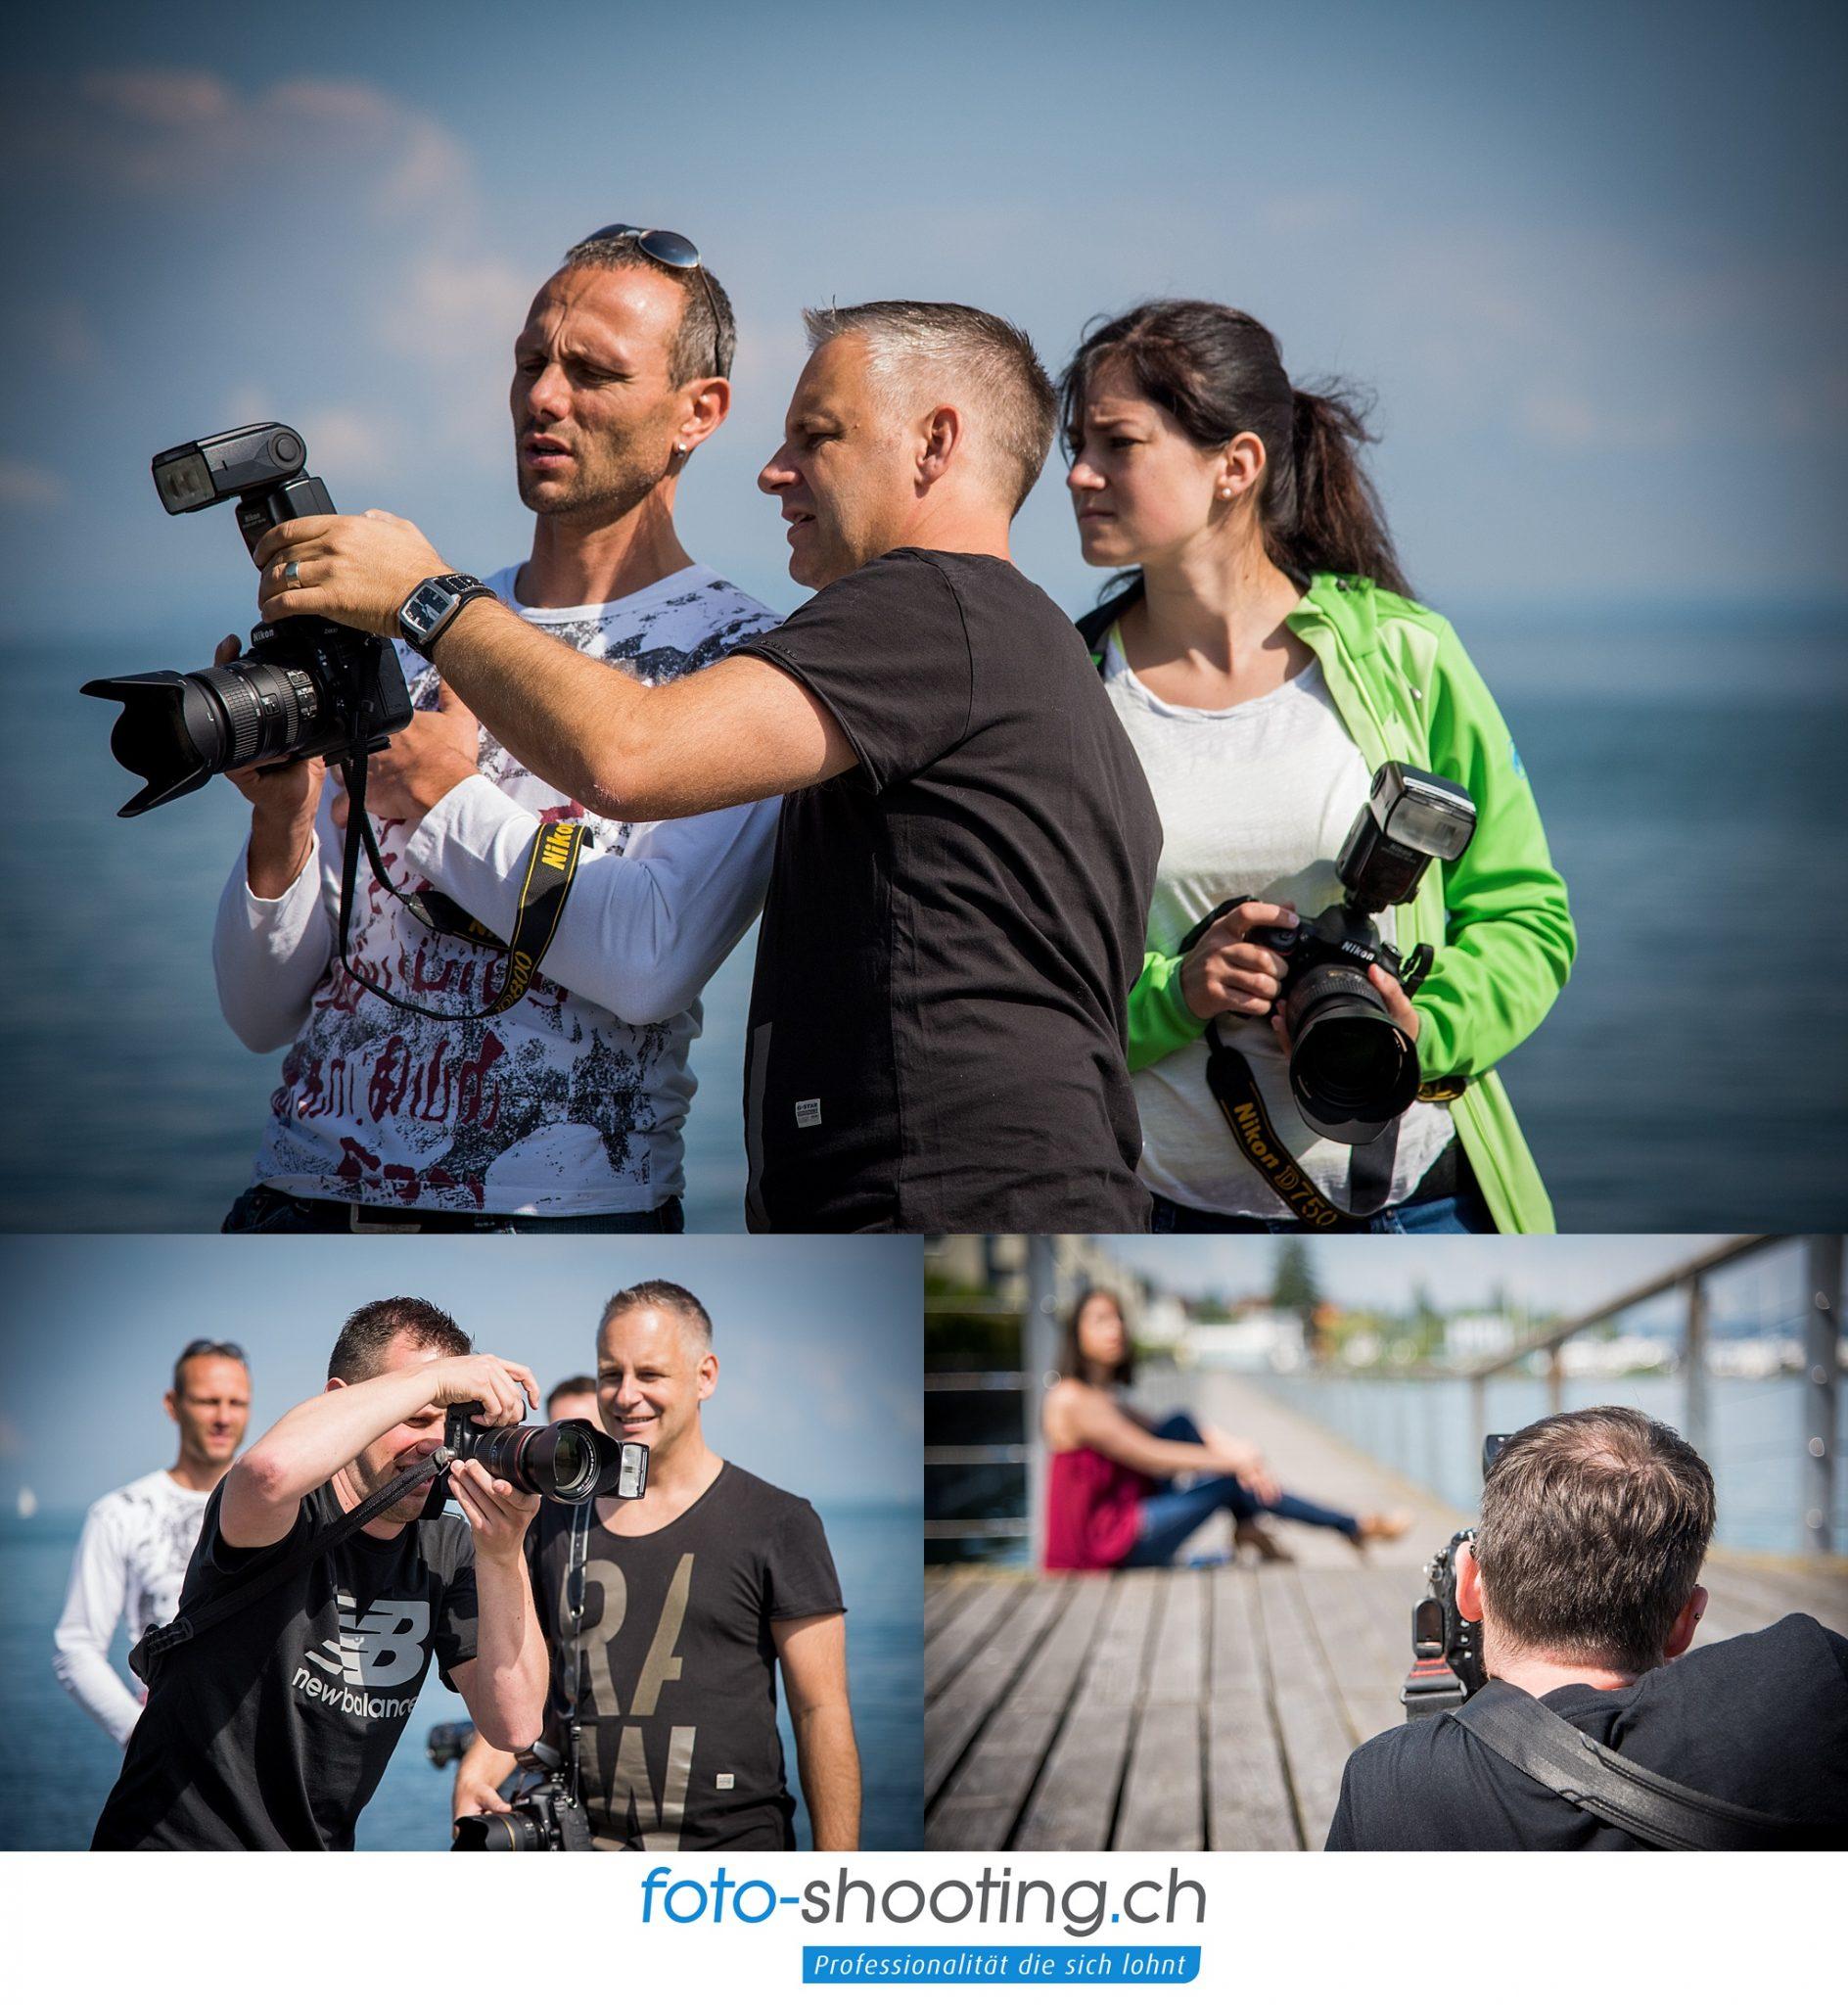 fotoshooting_fotograf_model_fotostudio_zuerich_ostschweiz_0409